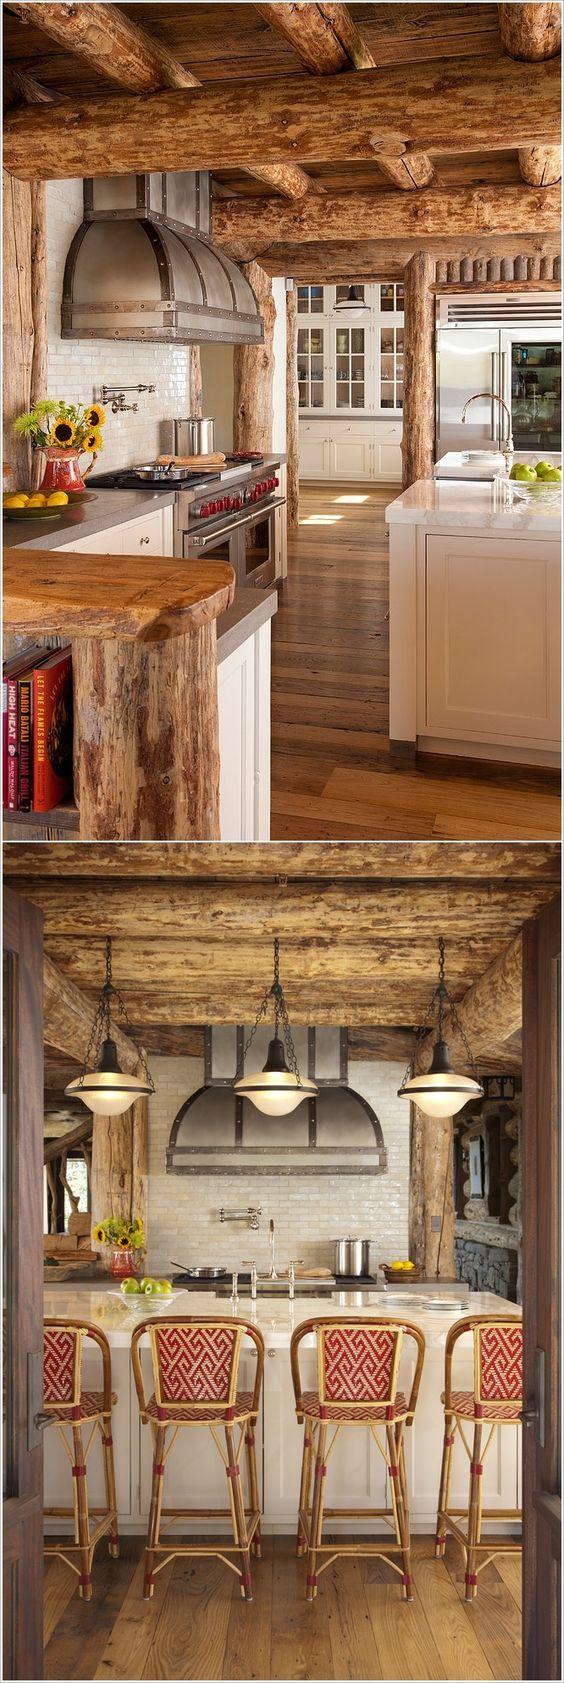 Beautiful log house kitchen interior https://www.quick-garden.co.uk/residential-log-cabins.html